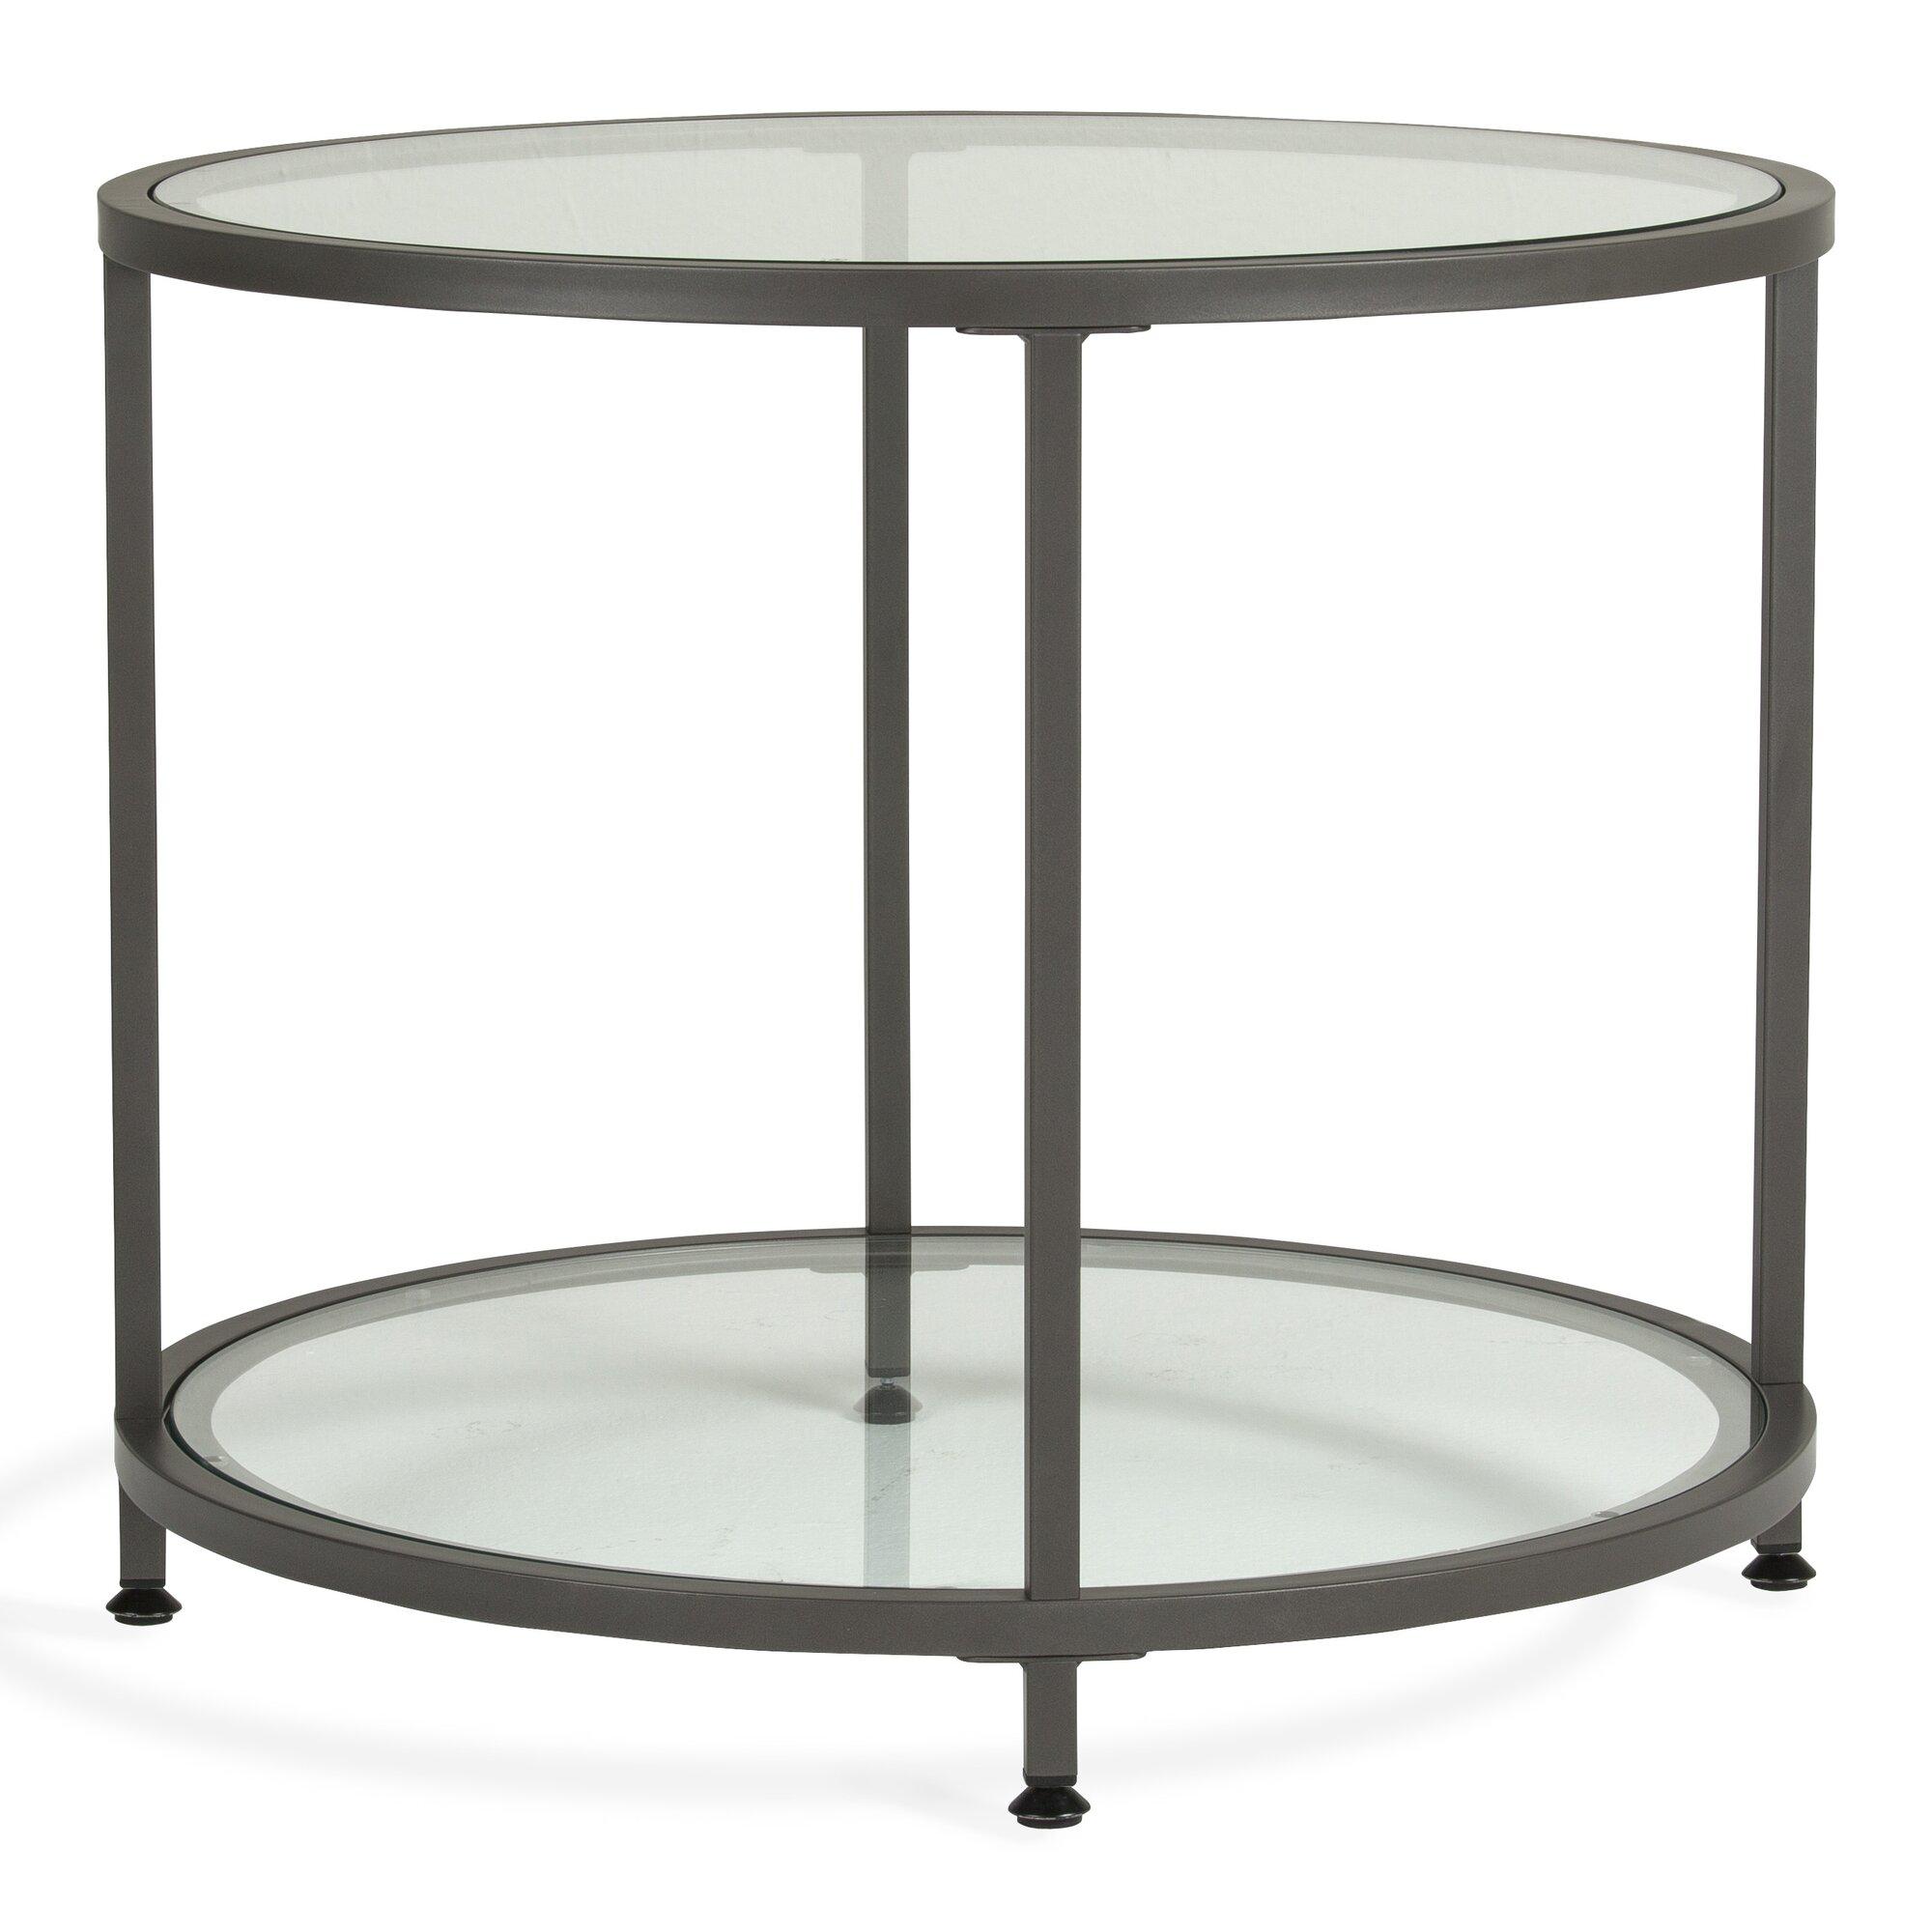 Studio Designs Home Camber End Table Reviews Wayfair